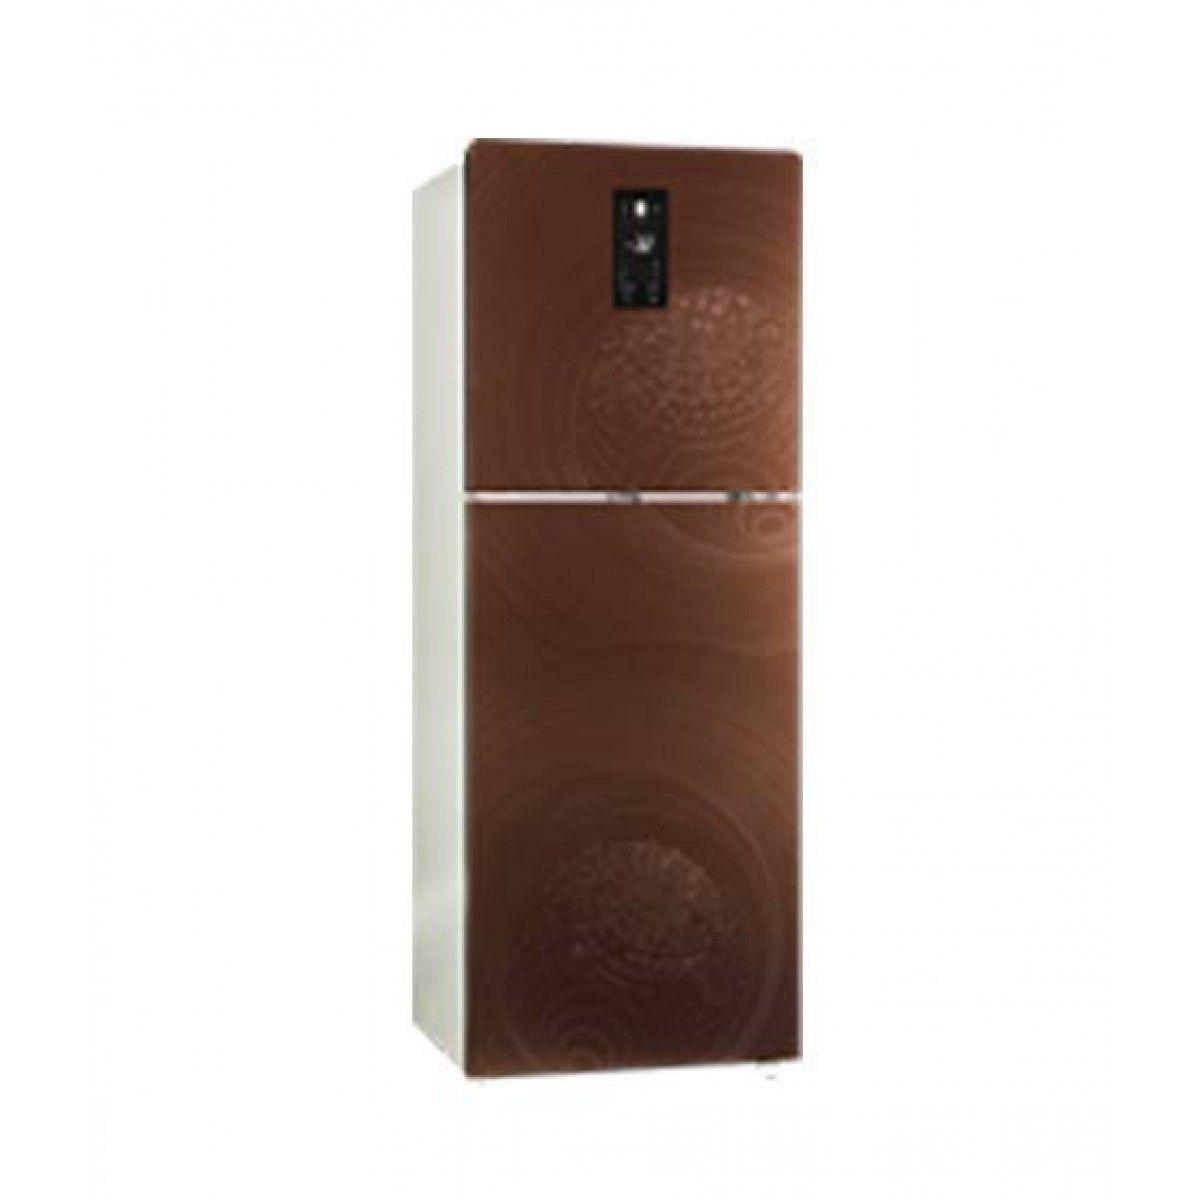 Changhong Ruba CHR-DD338GPR 12 cu ft Refrigerator